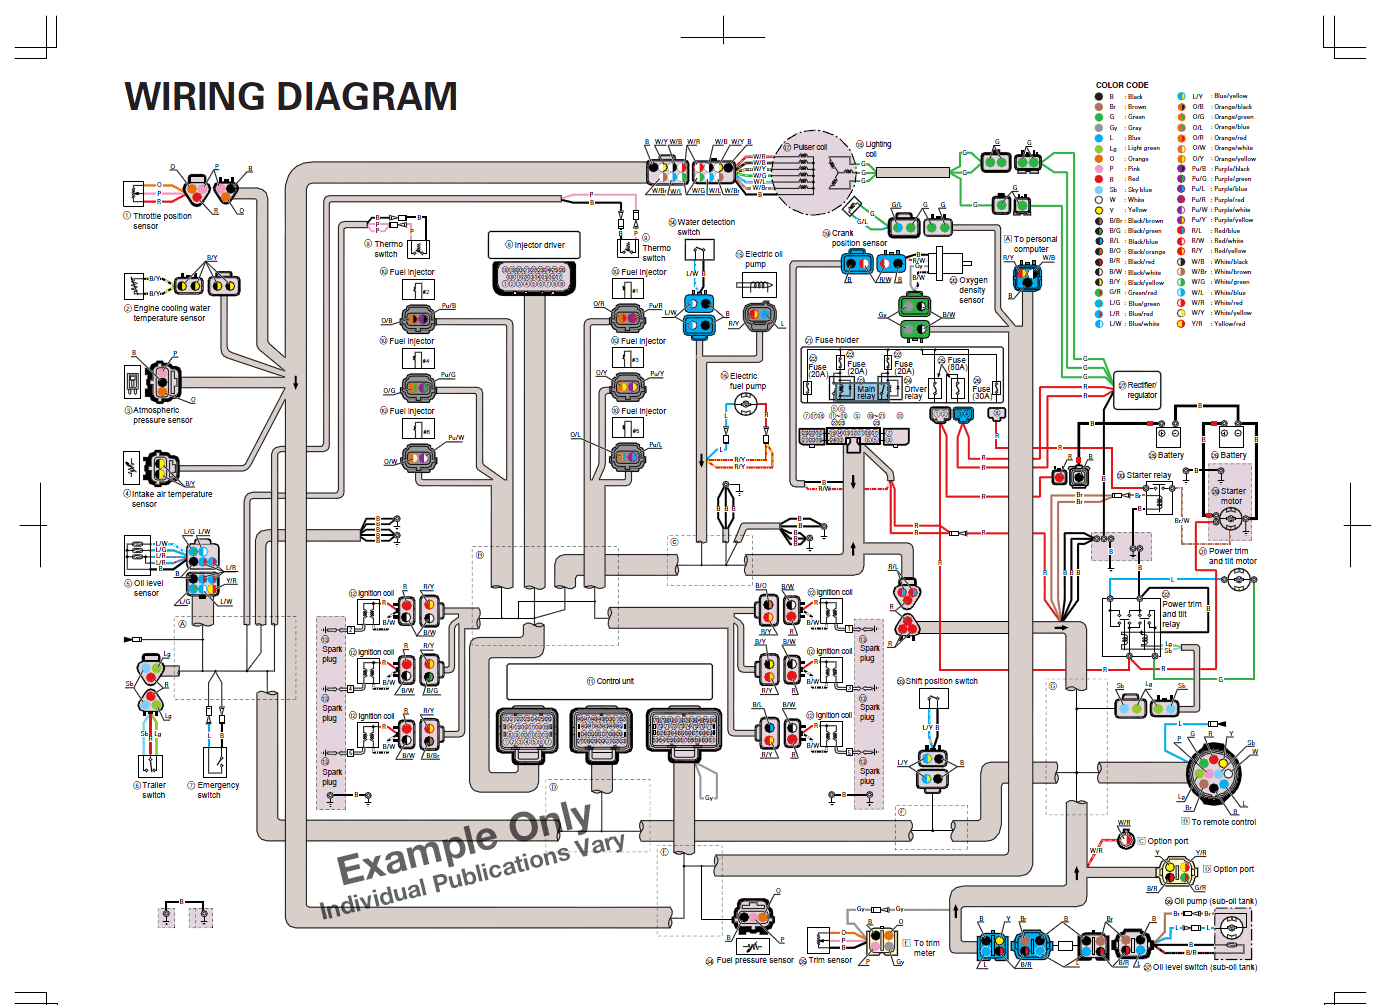 suzuki df140 wiring diagram pioneer avic n1 cpn1899 yamaha outboard diagrams  the